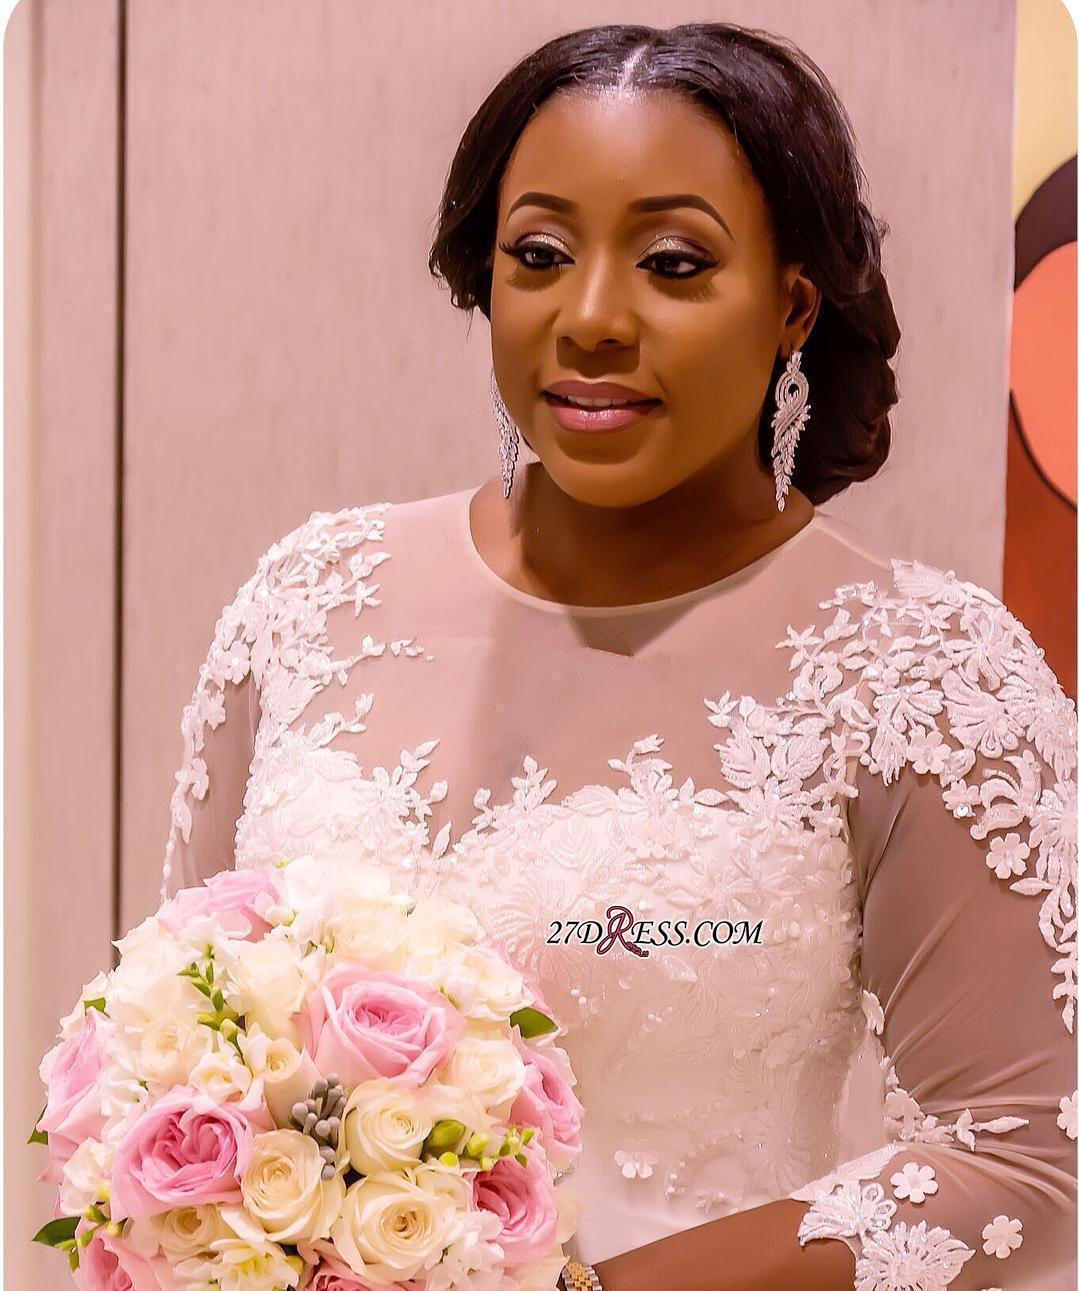 plus size wedding dresses under 100 photo - 1